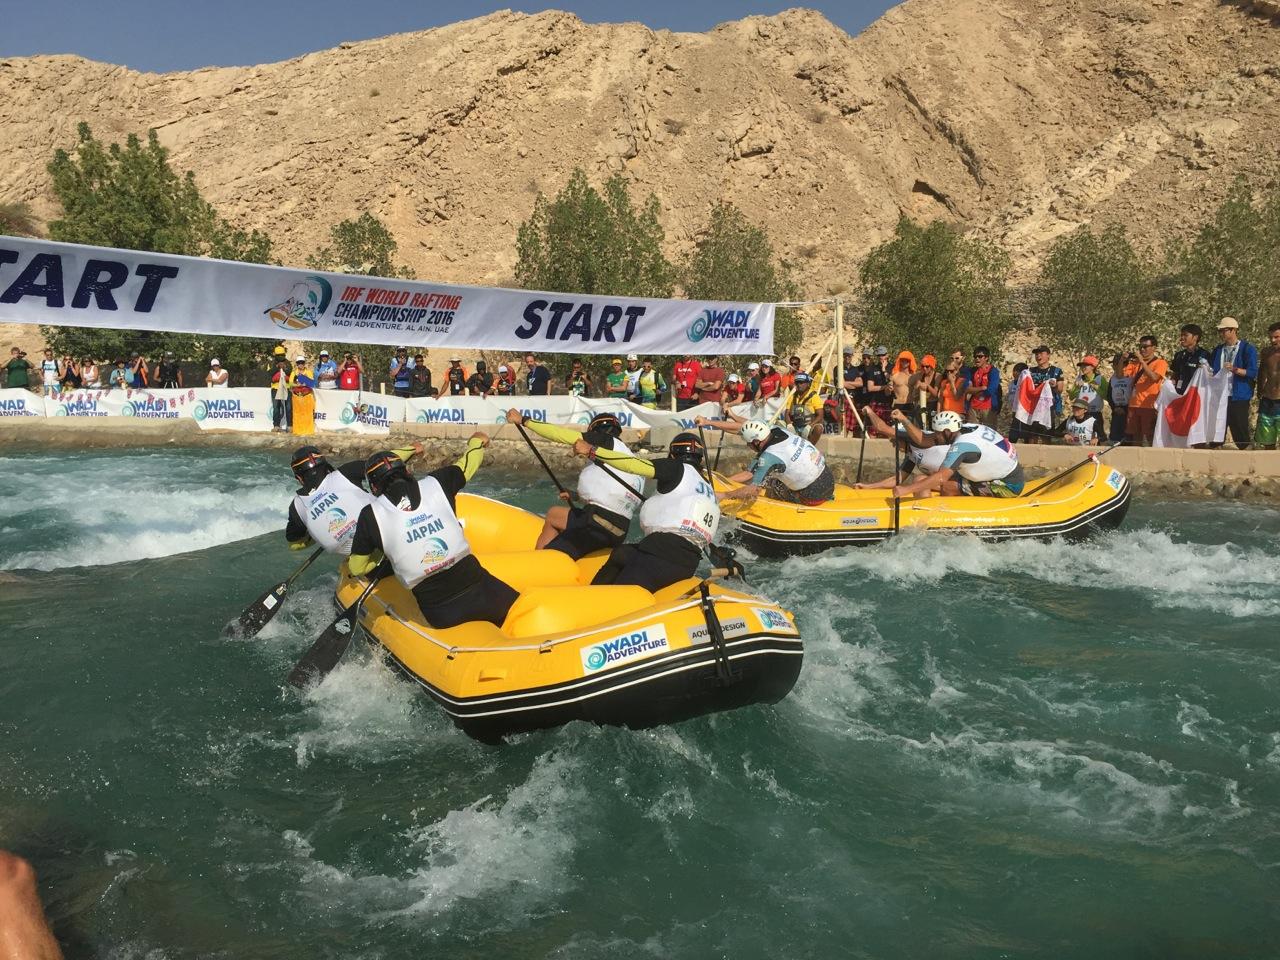 aquadesign-championnat-du-monde-rafting-2016-blog-6